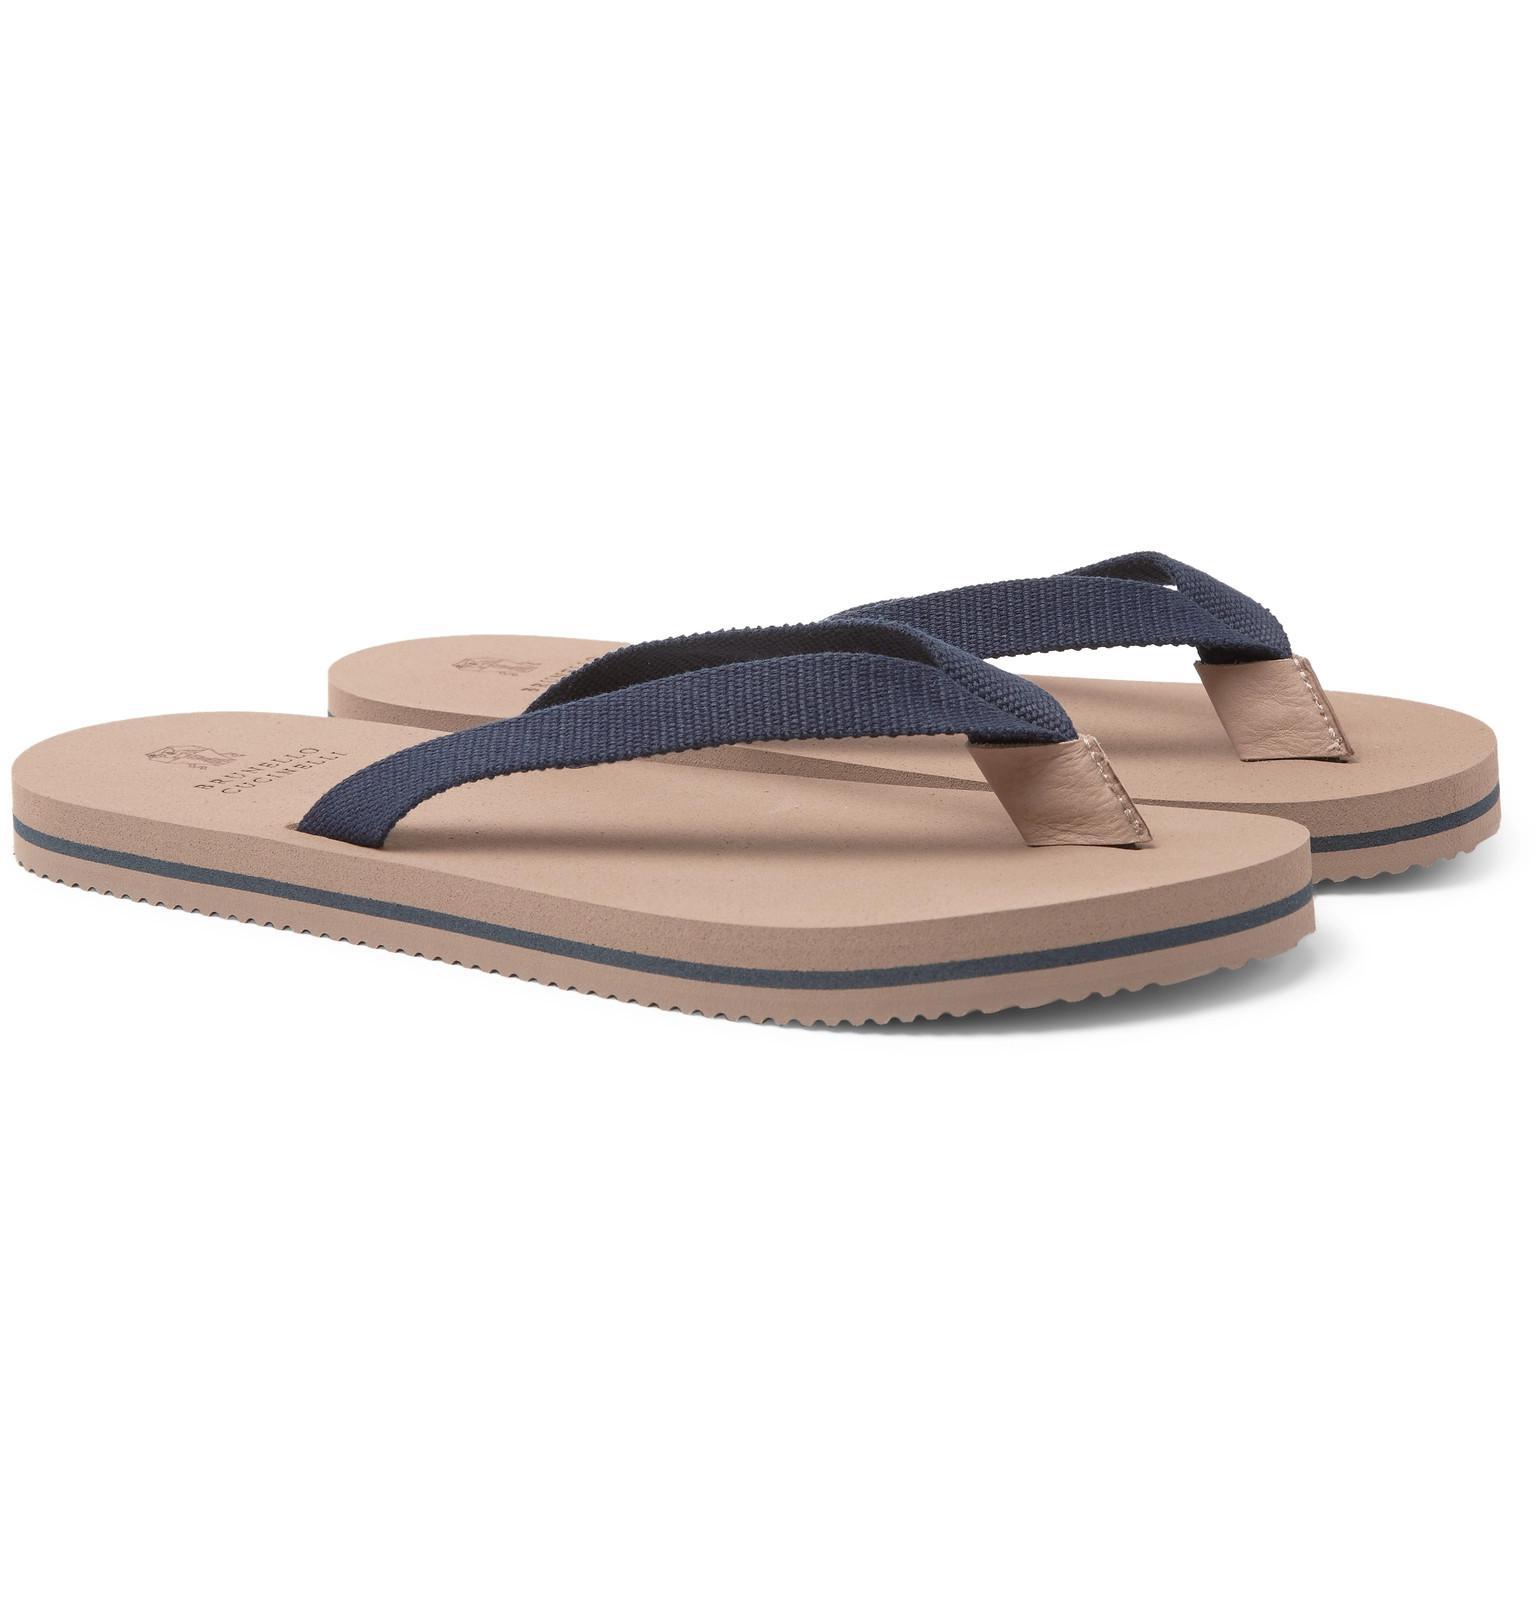 Brunello Cucinelli Cotton-Canvas Flip Flops free shipping official marketable 08fYpa